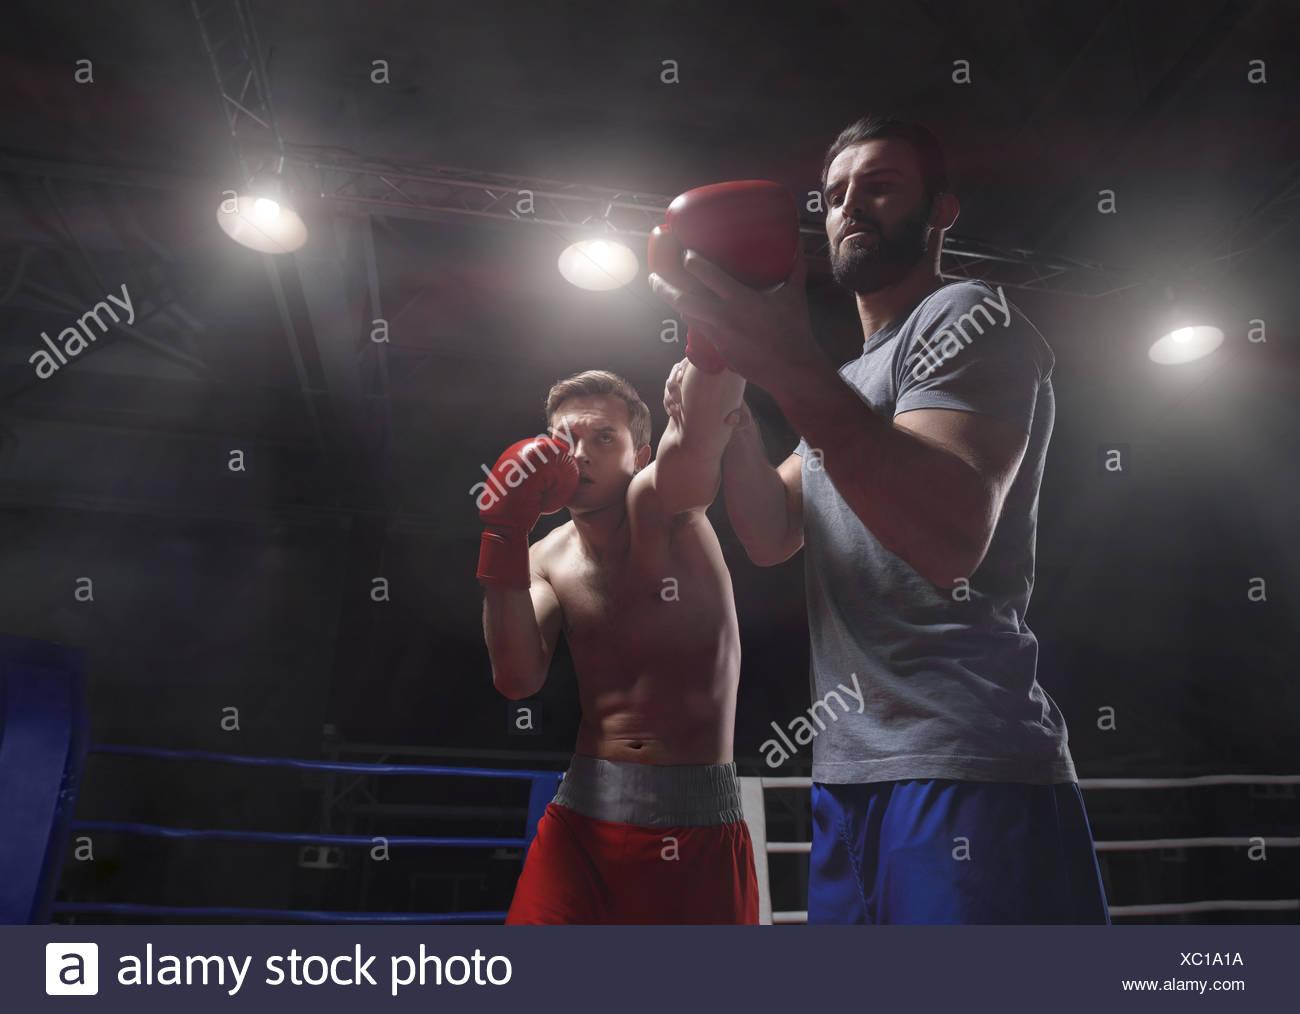 Professional sport - Stock Image